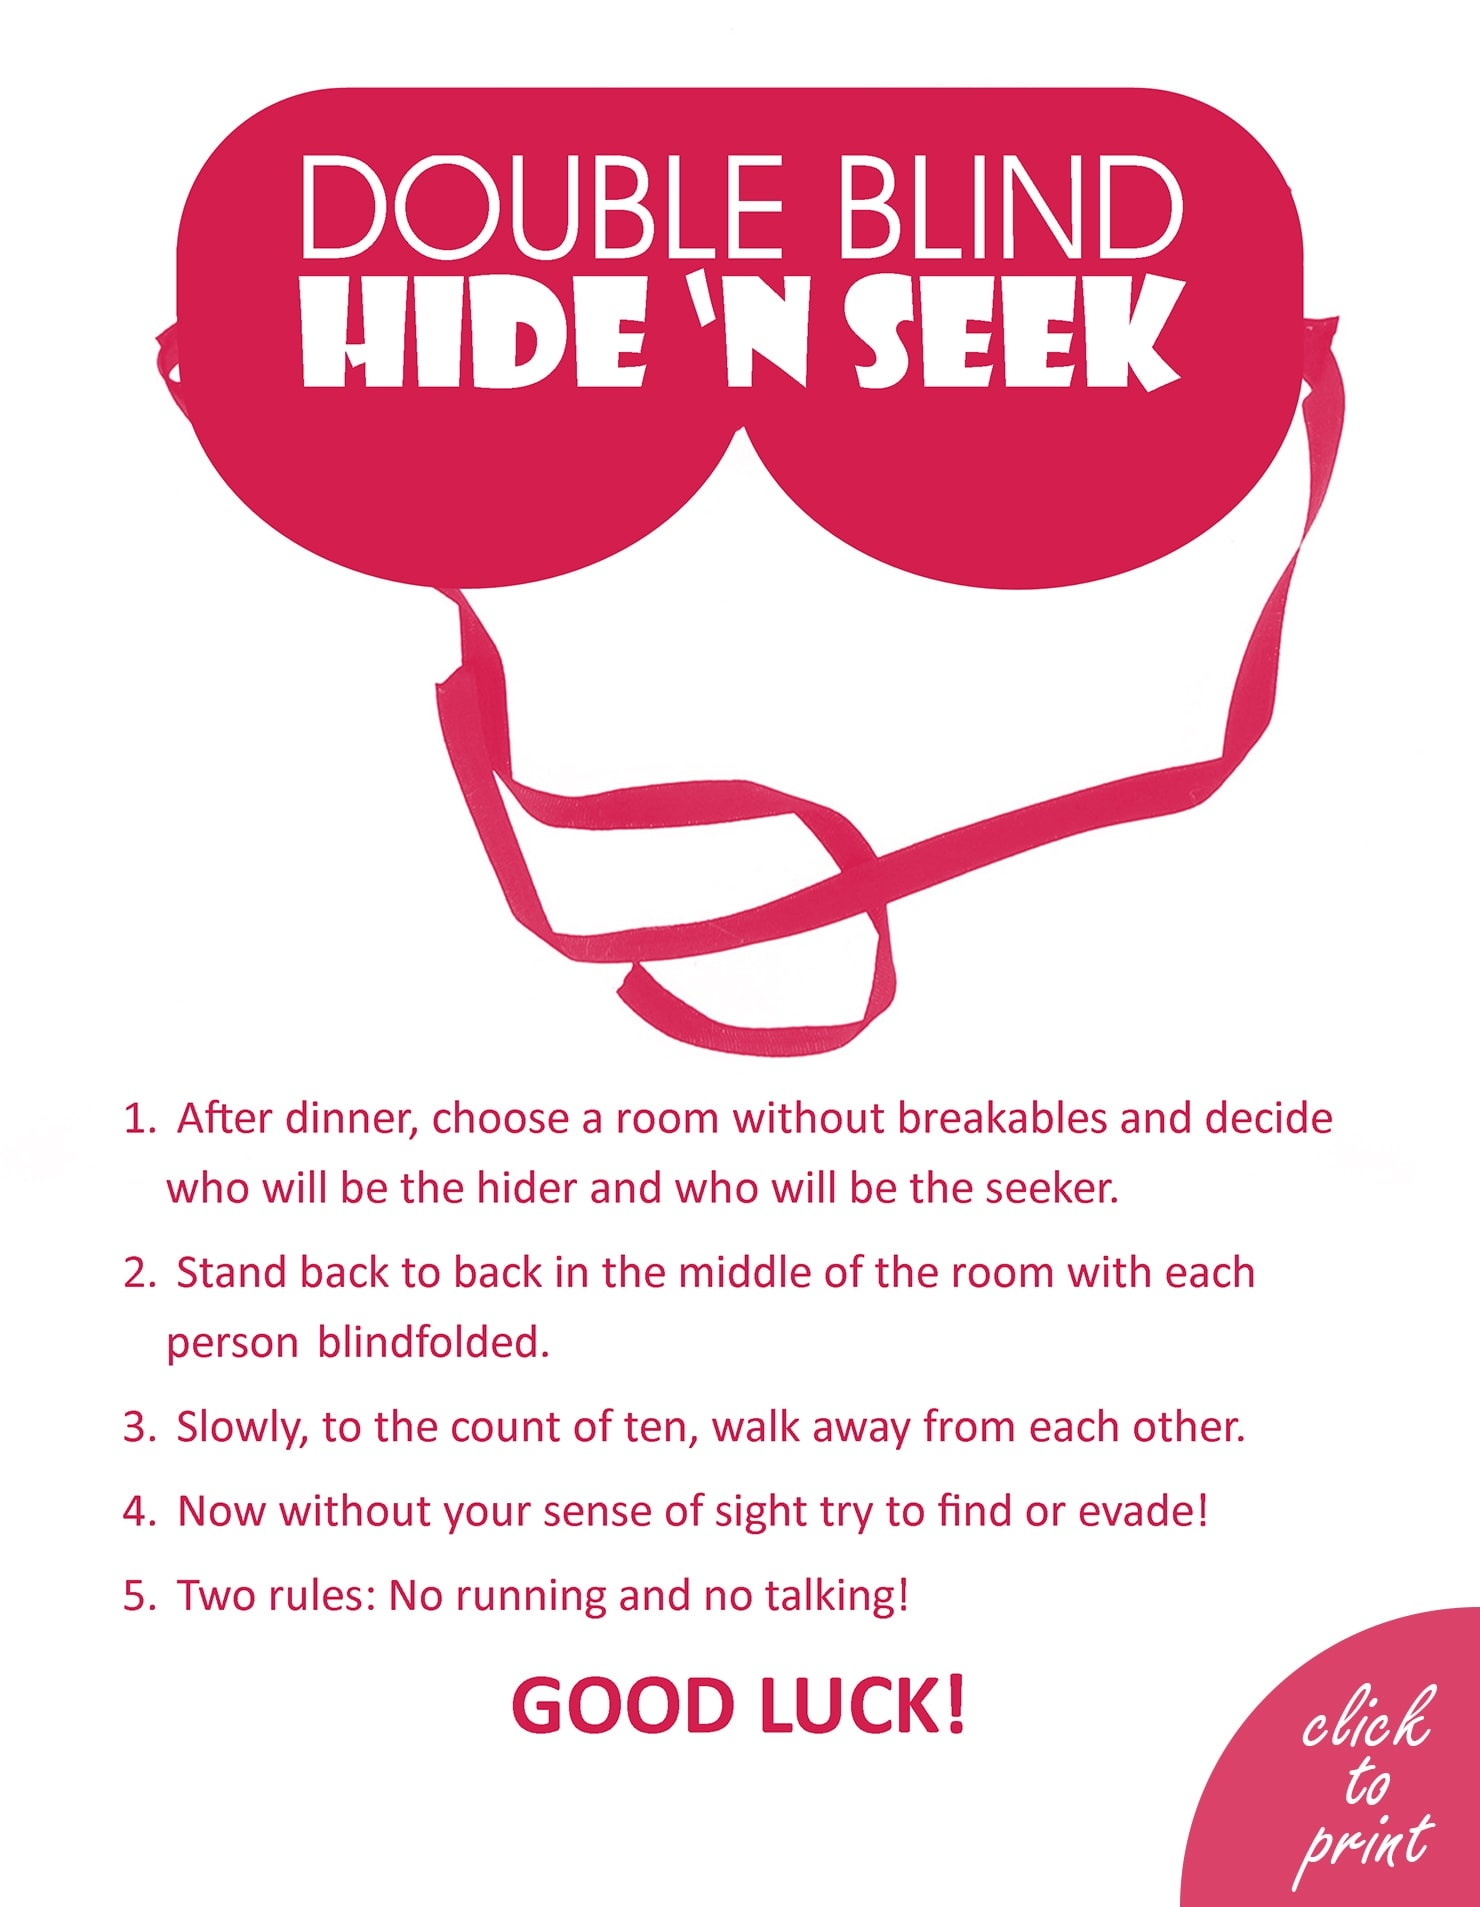 Double Blind Hide 'n Seek Instructions